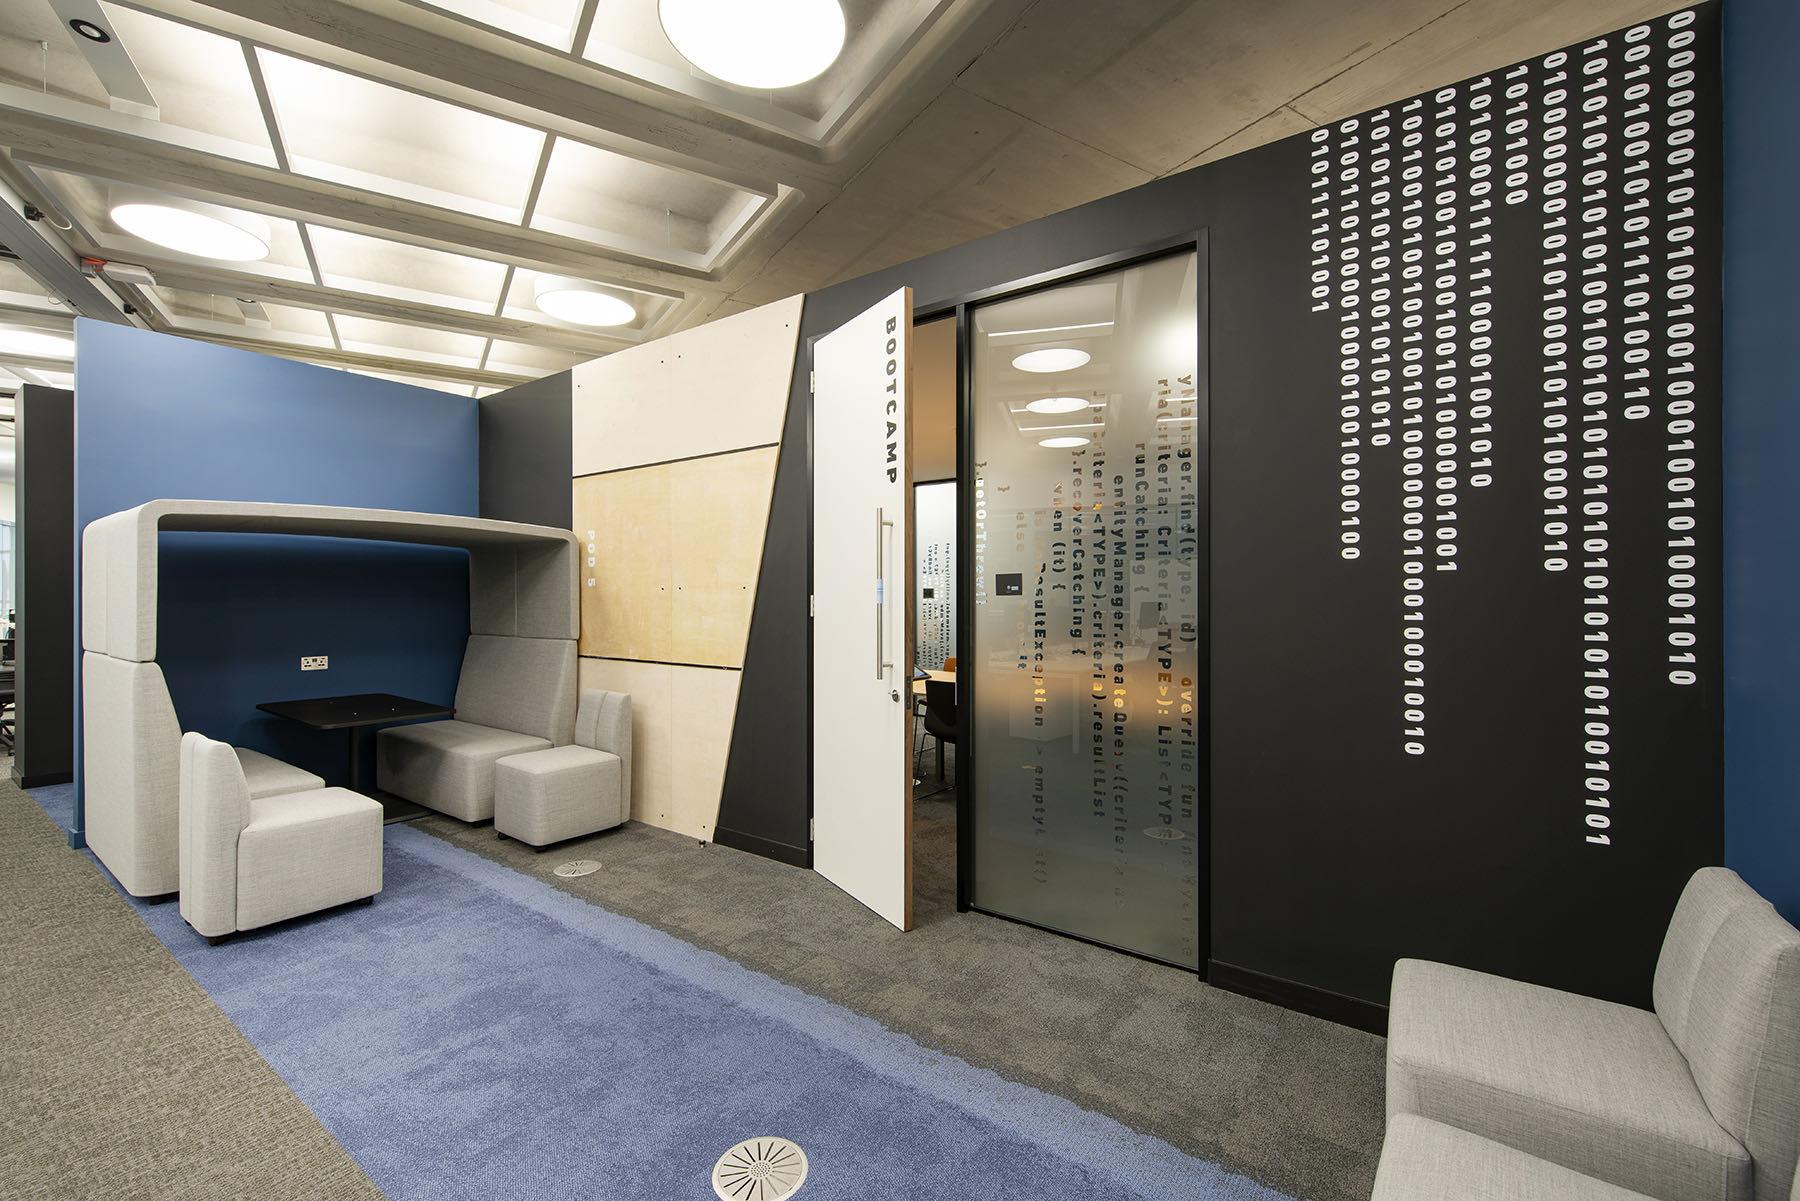 metapack-london-office-14